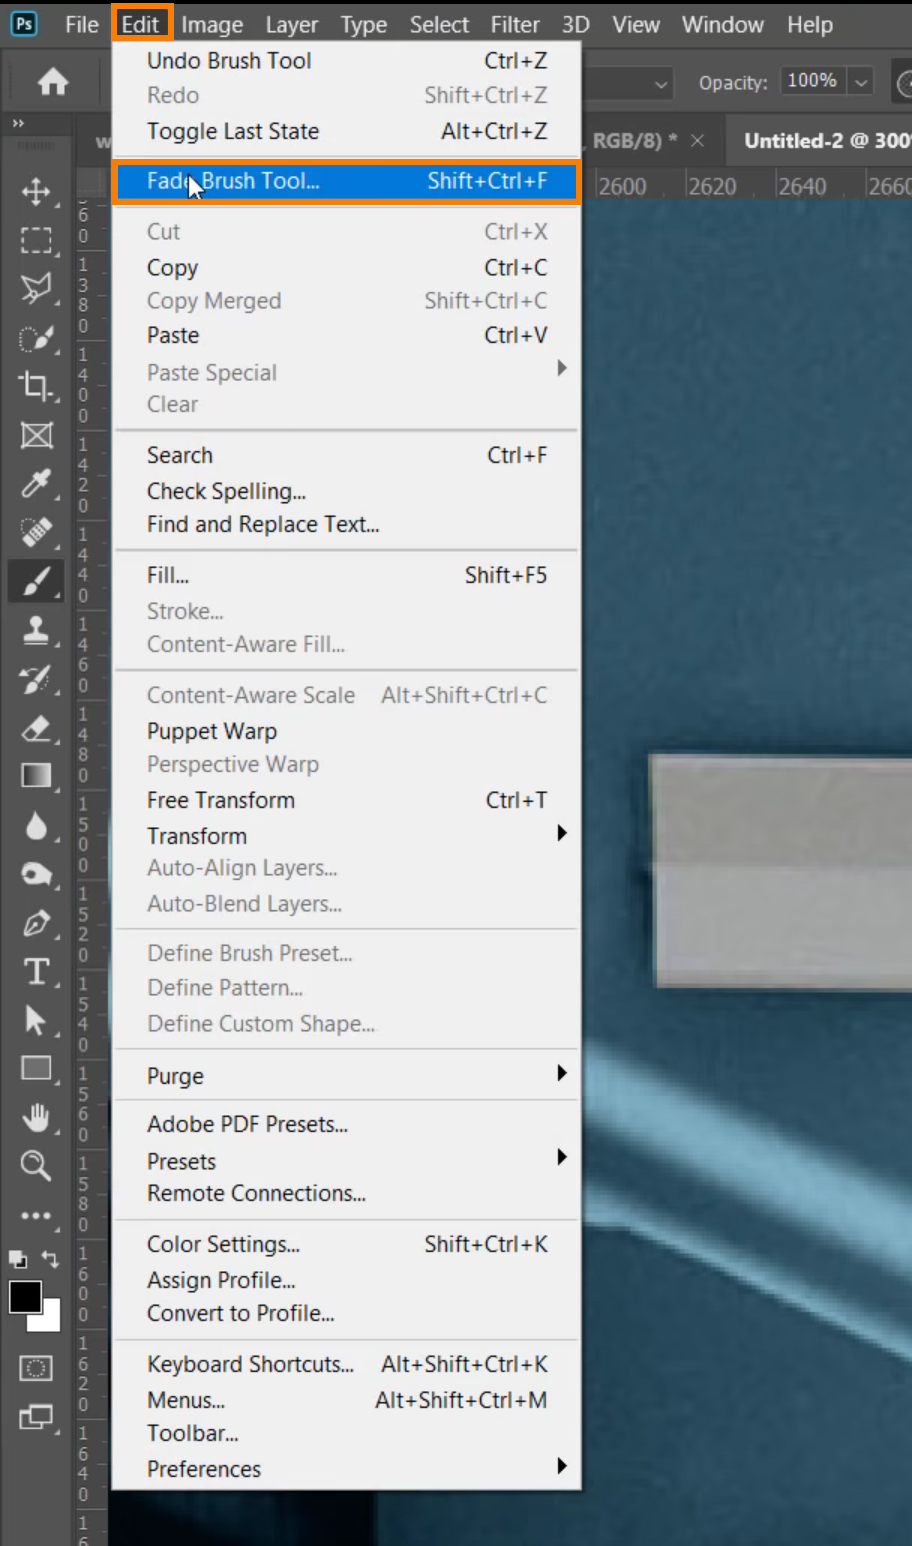 Choose Edit > Fade Brush Tool